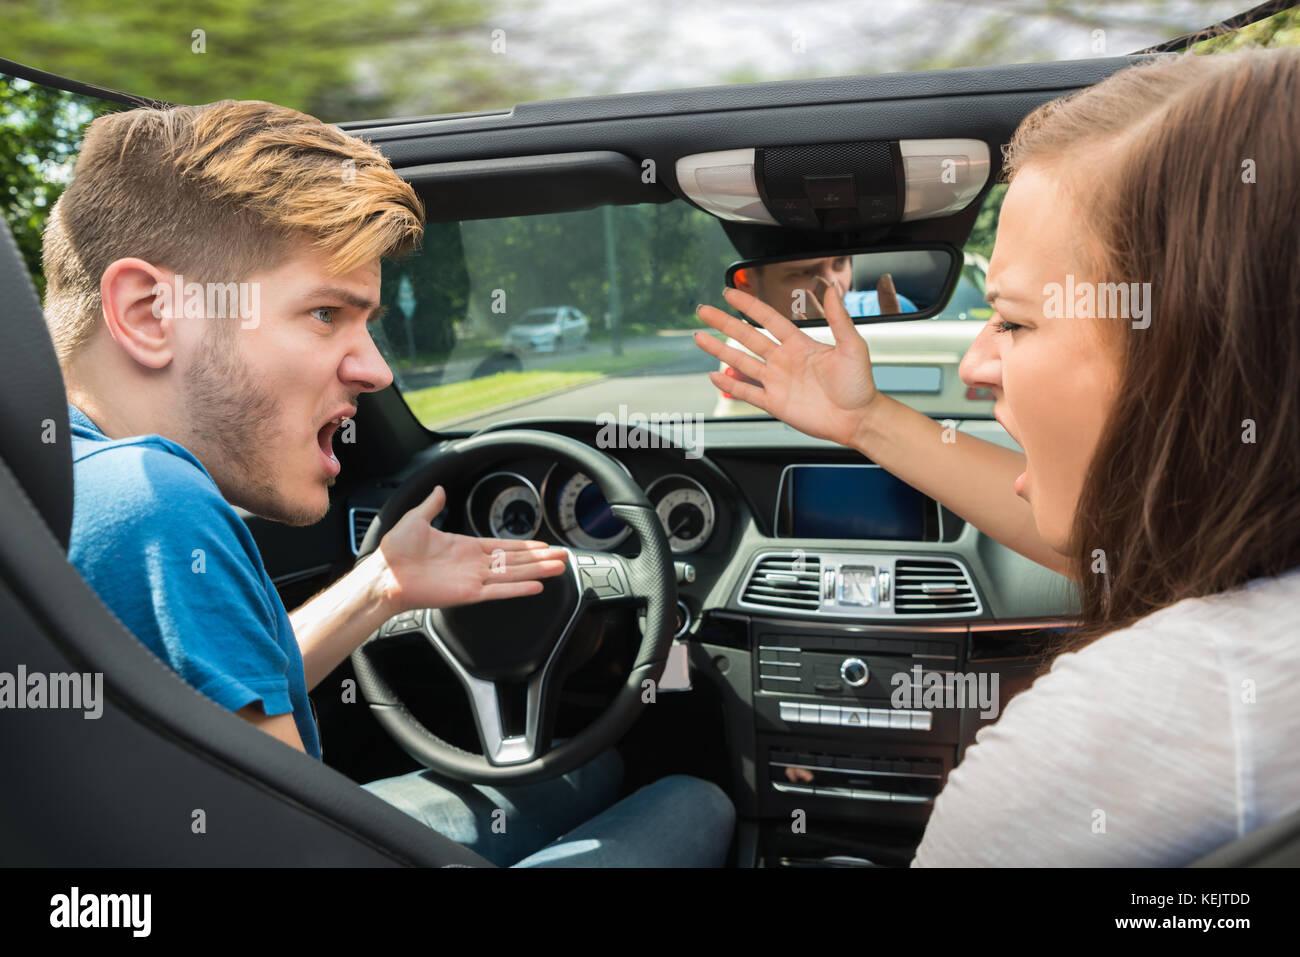 Infeliz pareja joven peleados en un coche Imagen De Stock